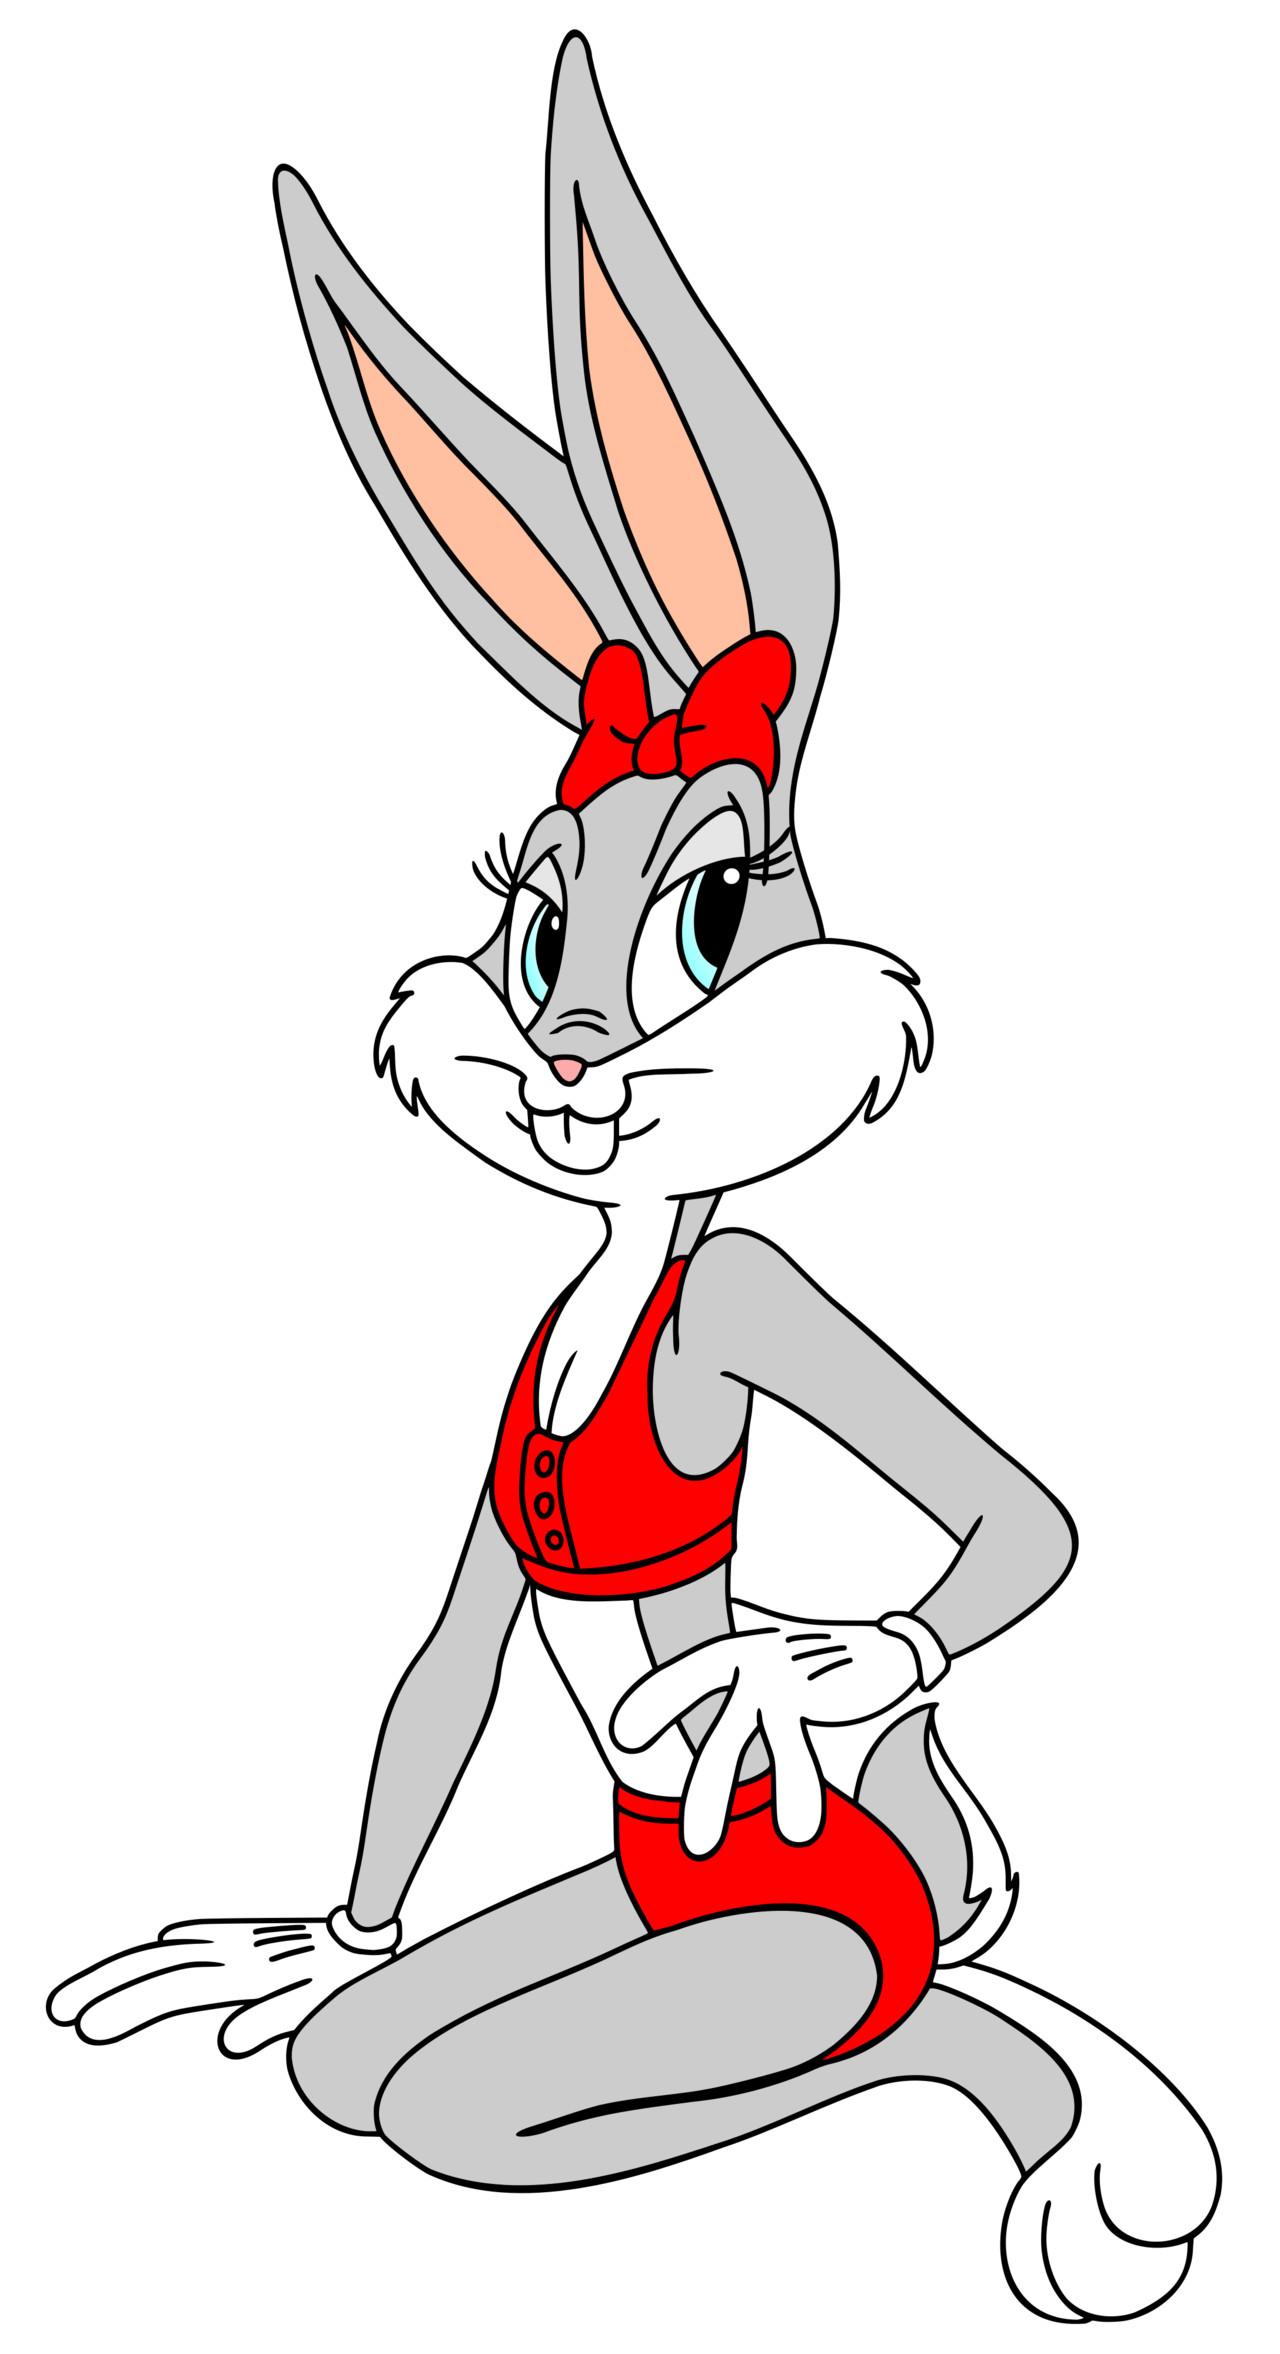 Original ⋅. Similar Wallpaper Images. Bugs Bunny …